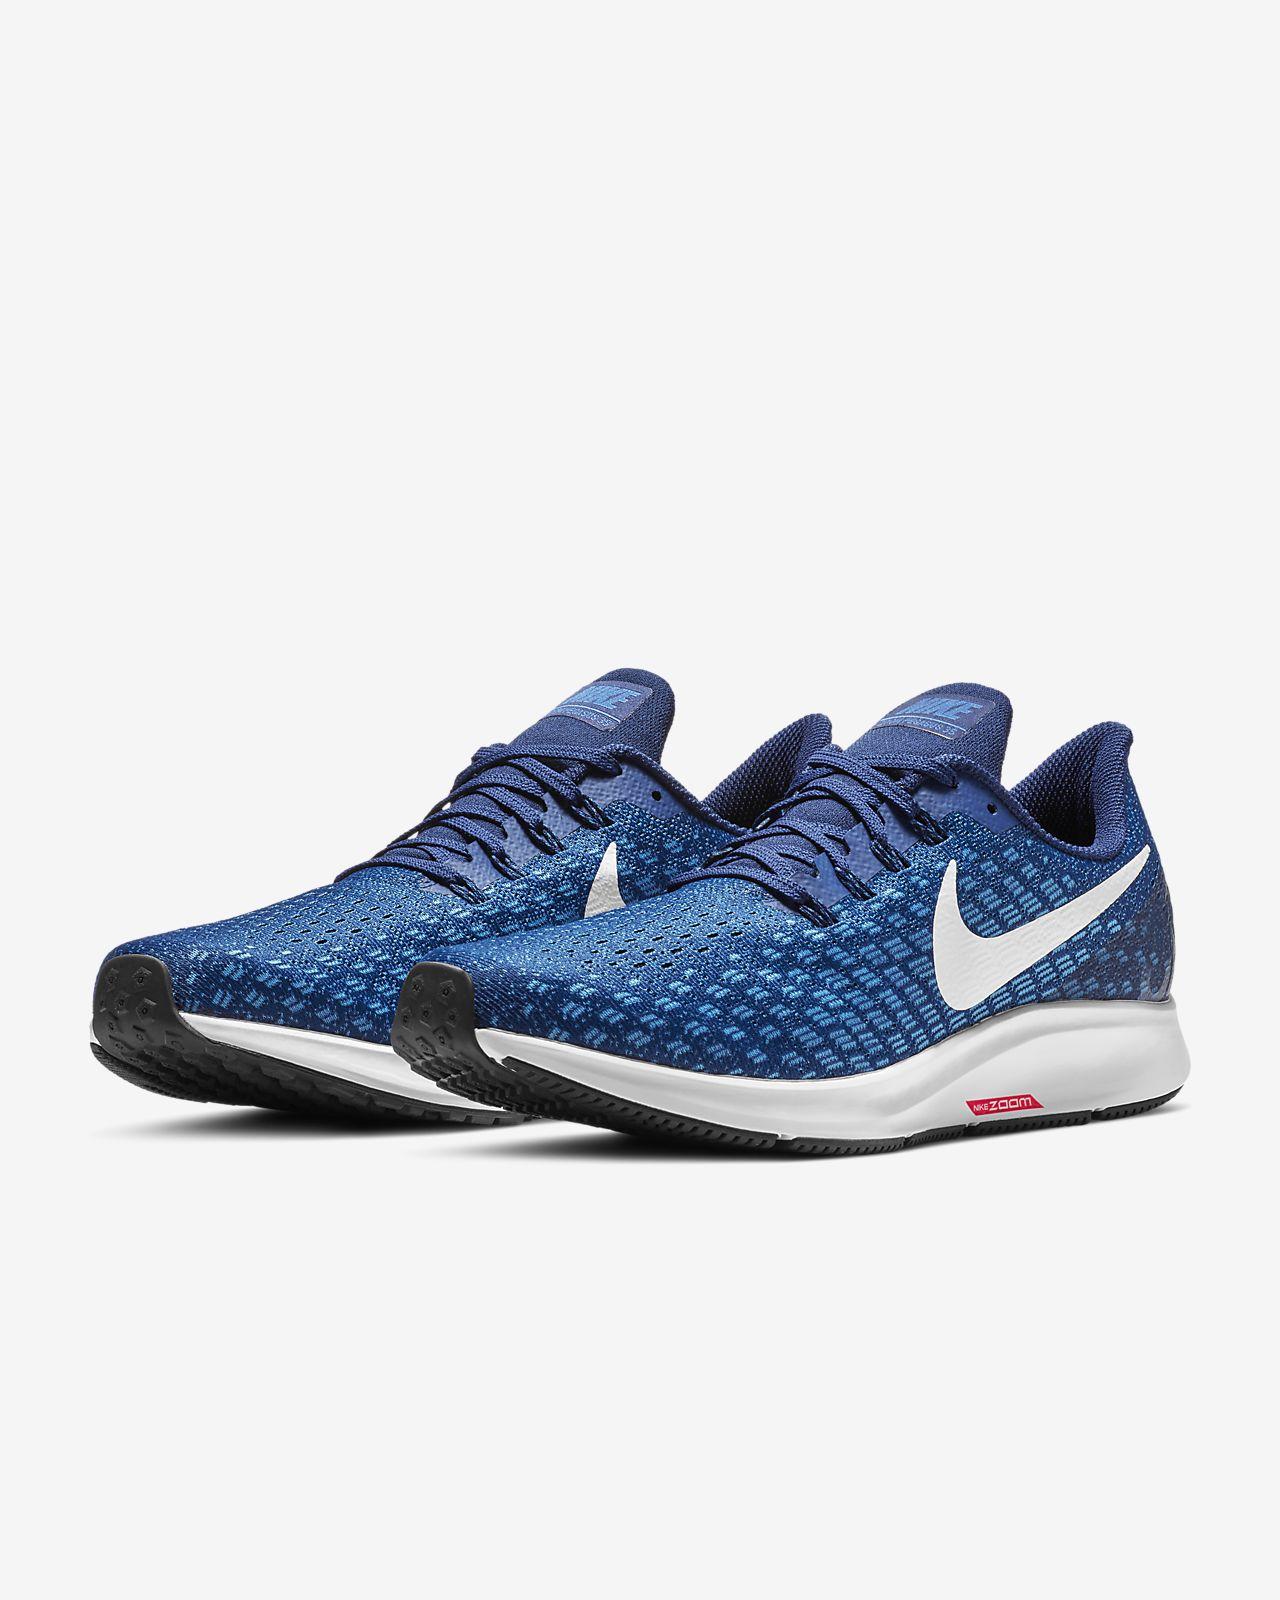 promo code 3976e 9fbdf ... Chaussure de running Nike Air Zoom Pegasus 35 pour Homme